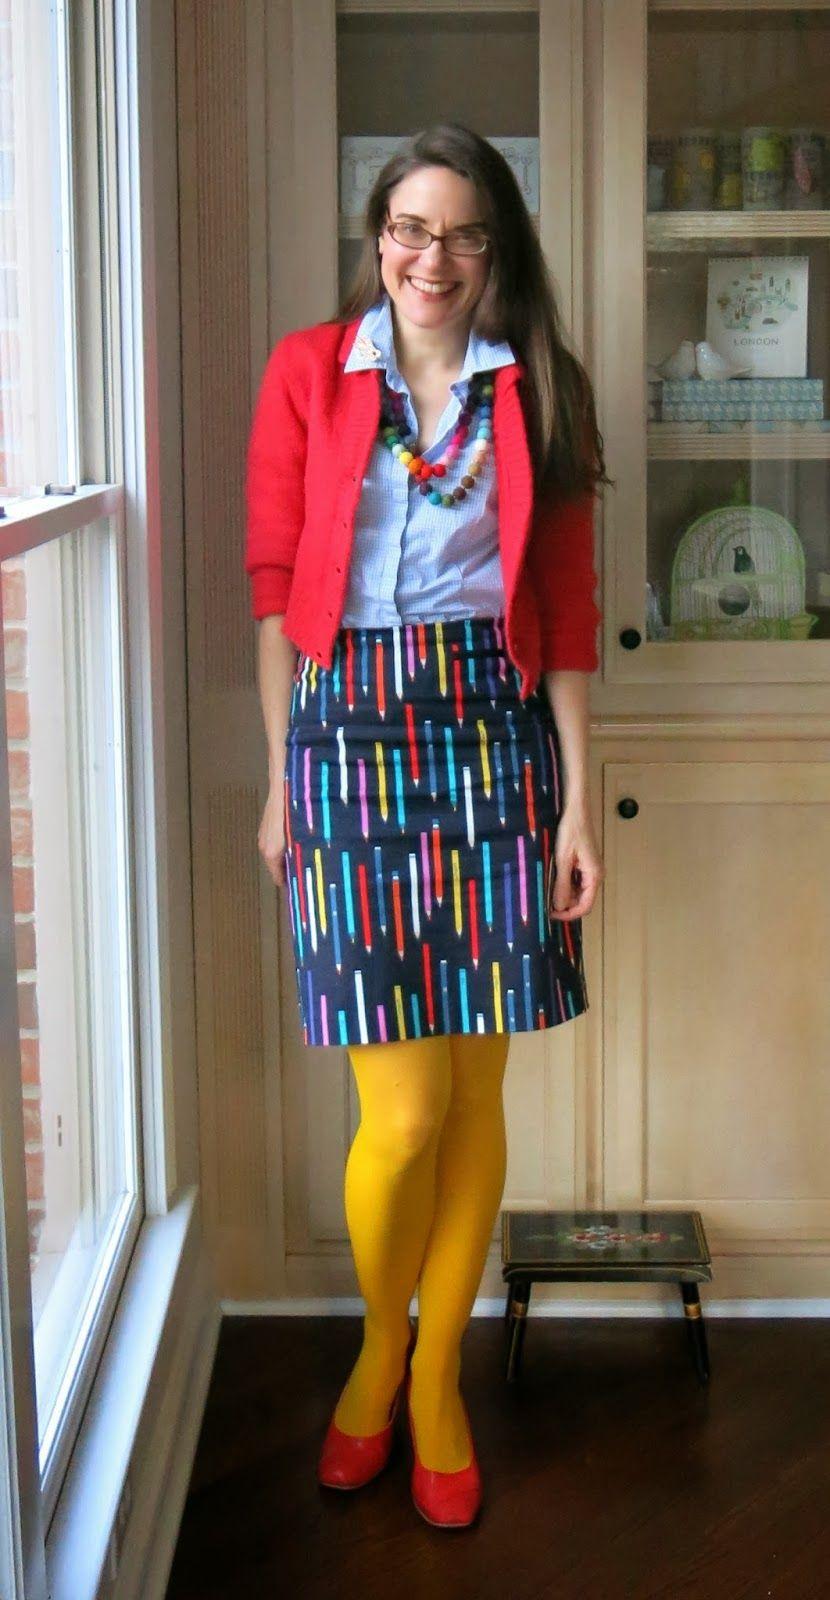 Love the fun play on pencil skirt its fun when fashion